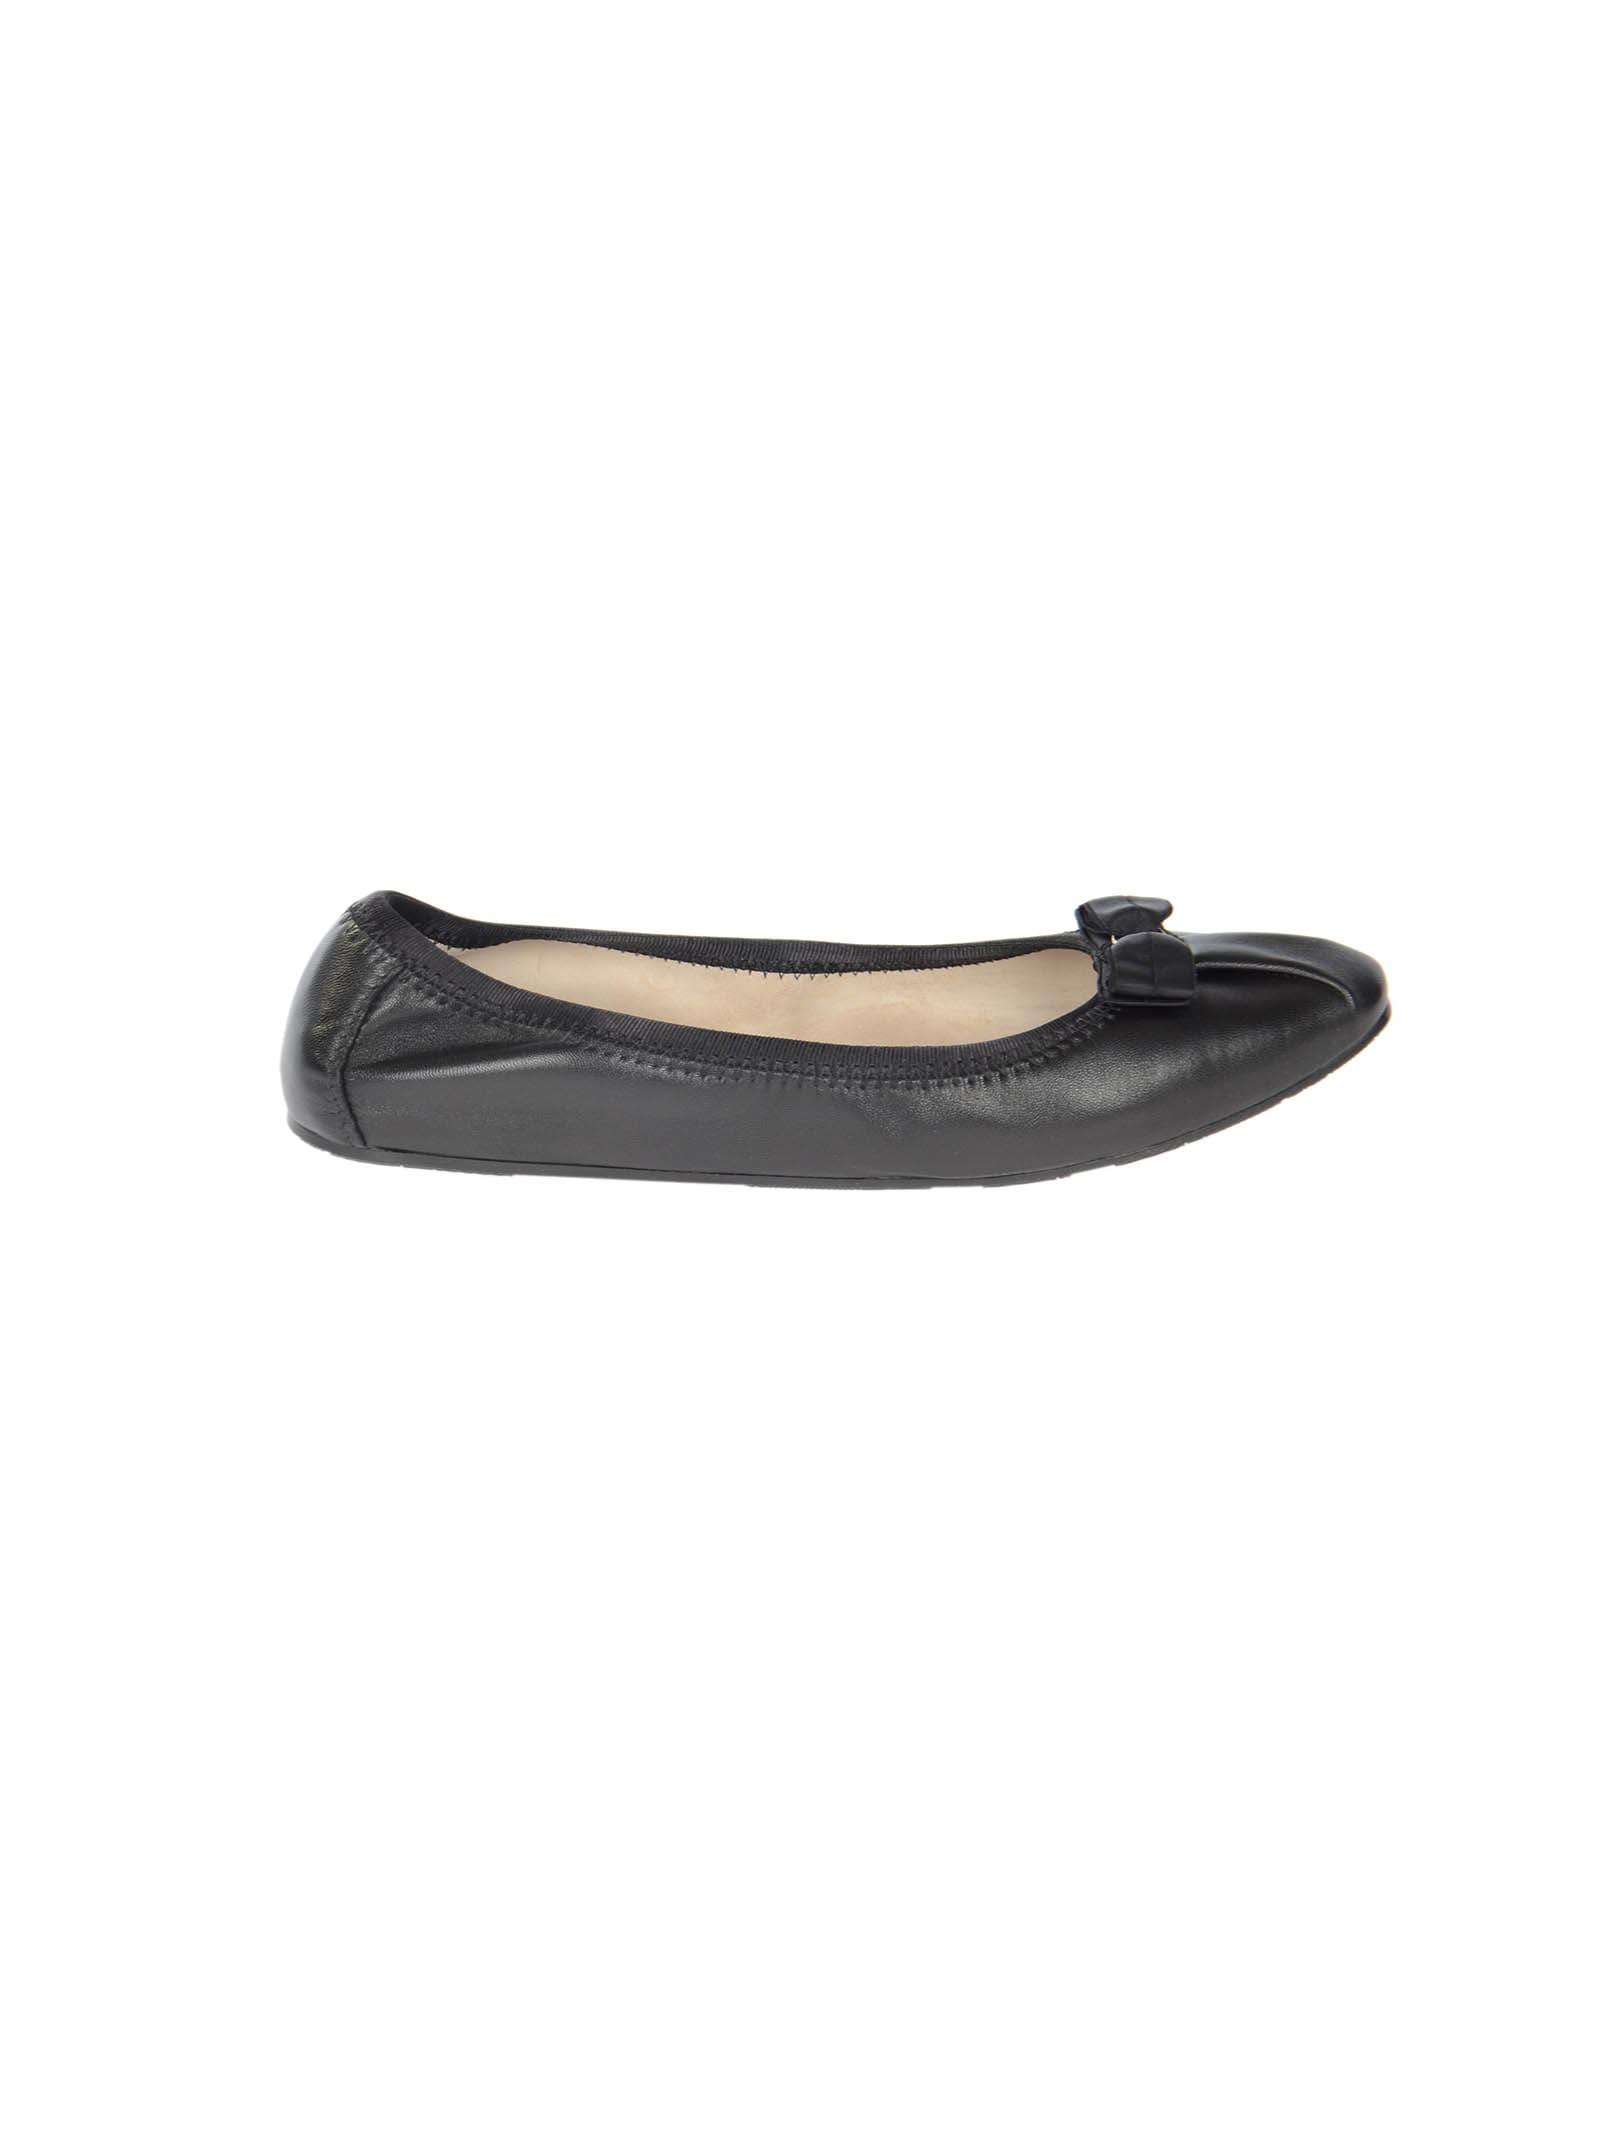 Salvatore Ferragamo My Joy Calf Leather Flat Shoes